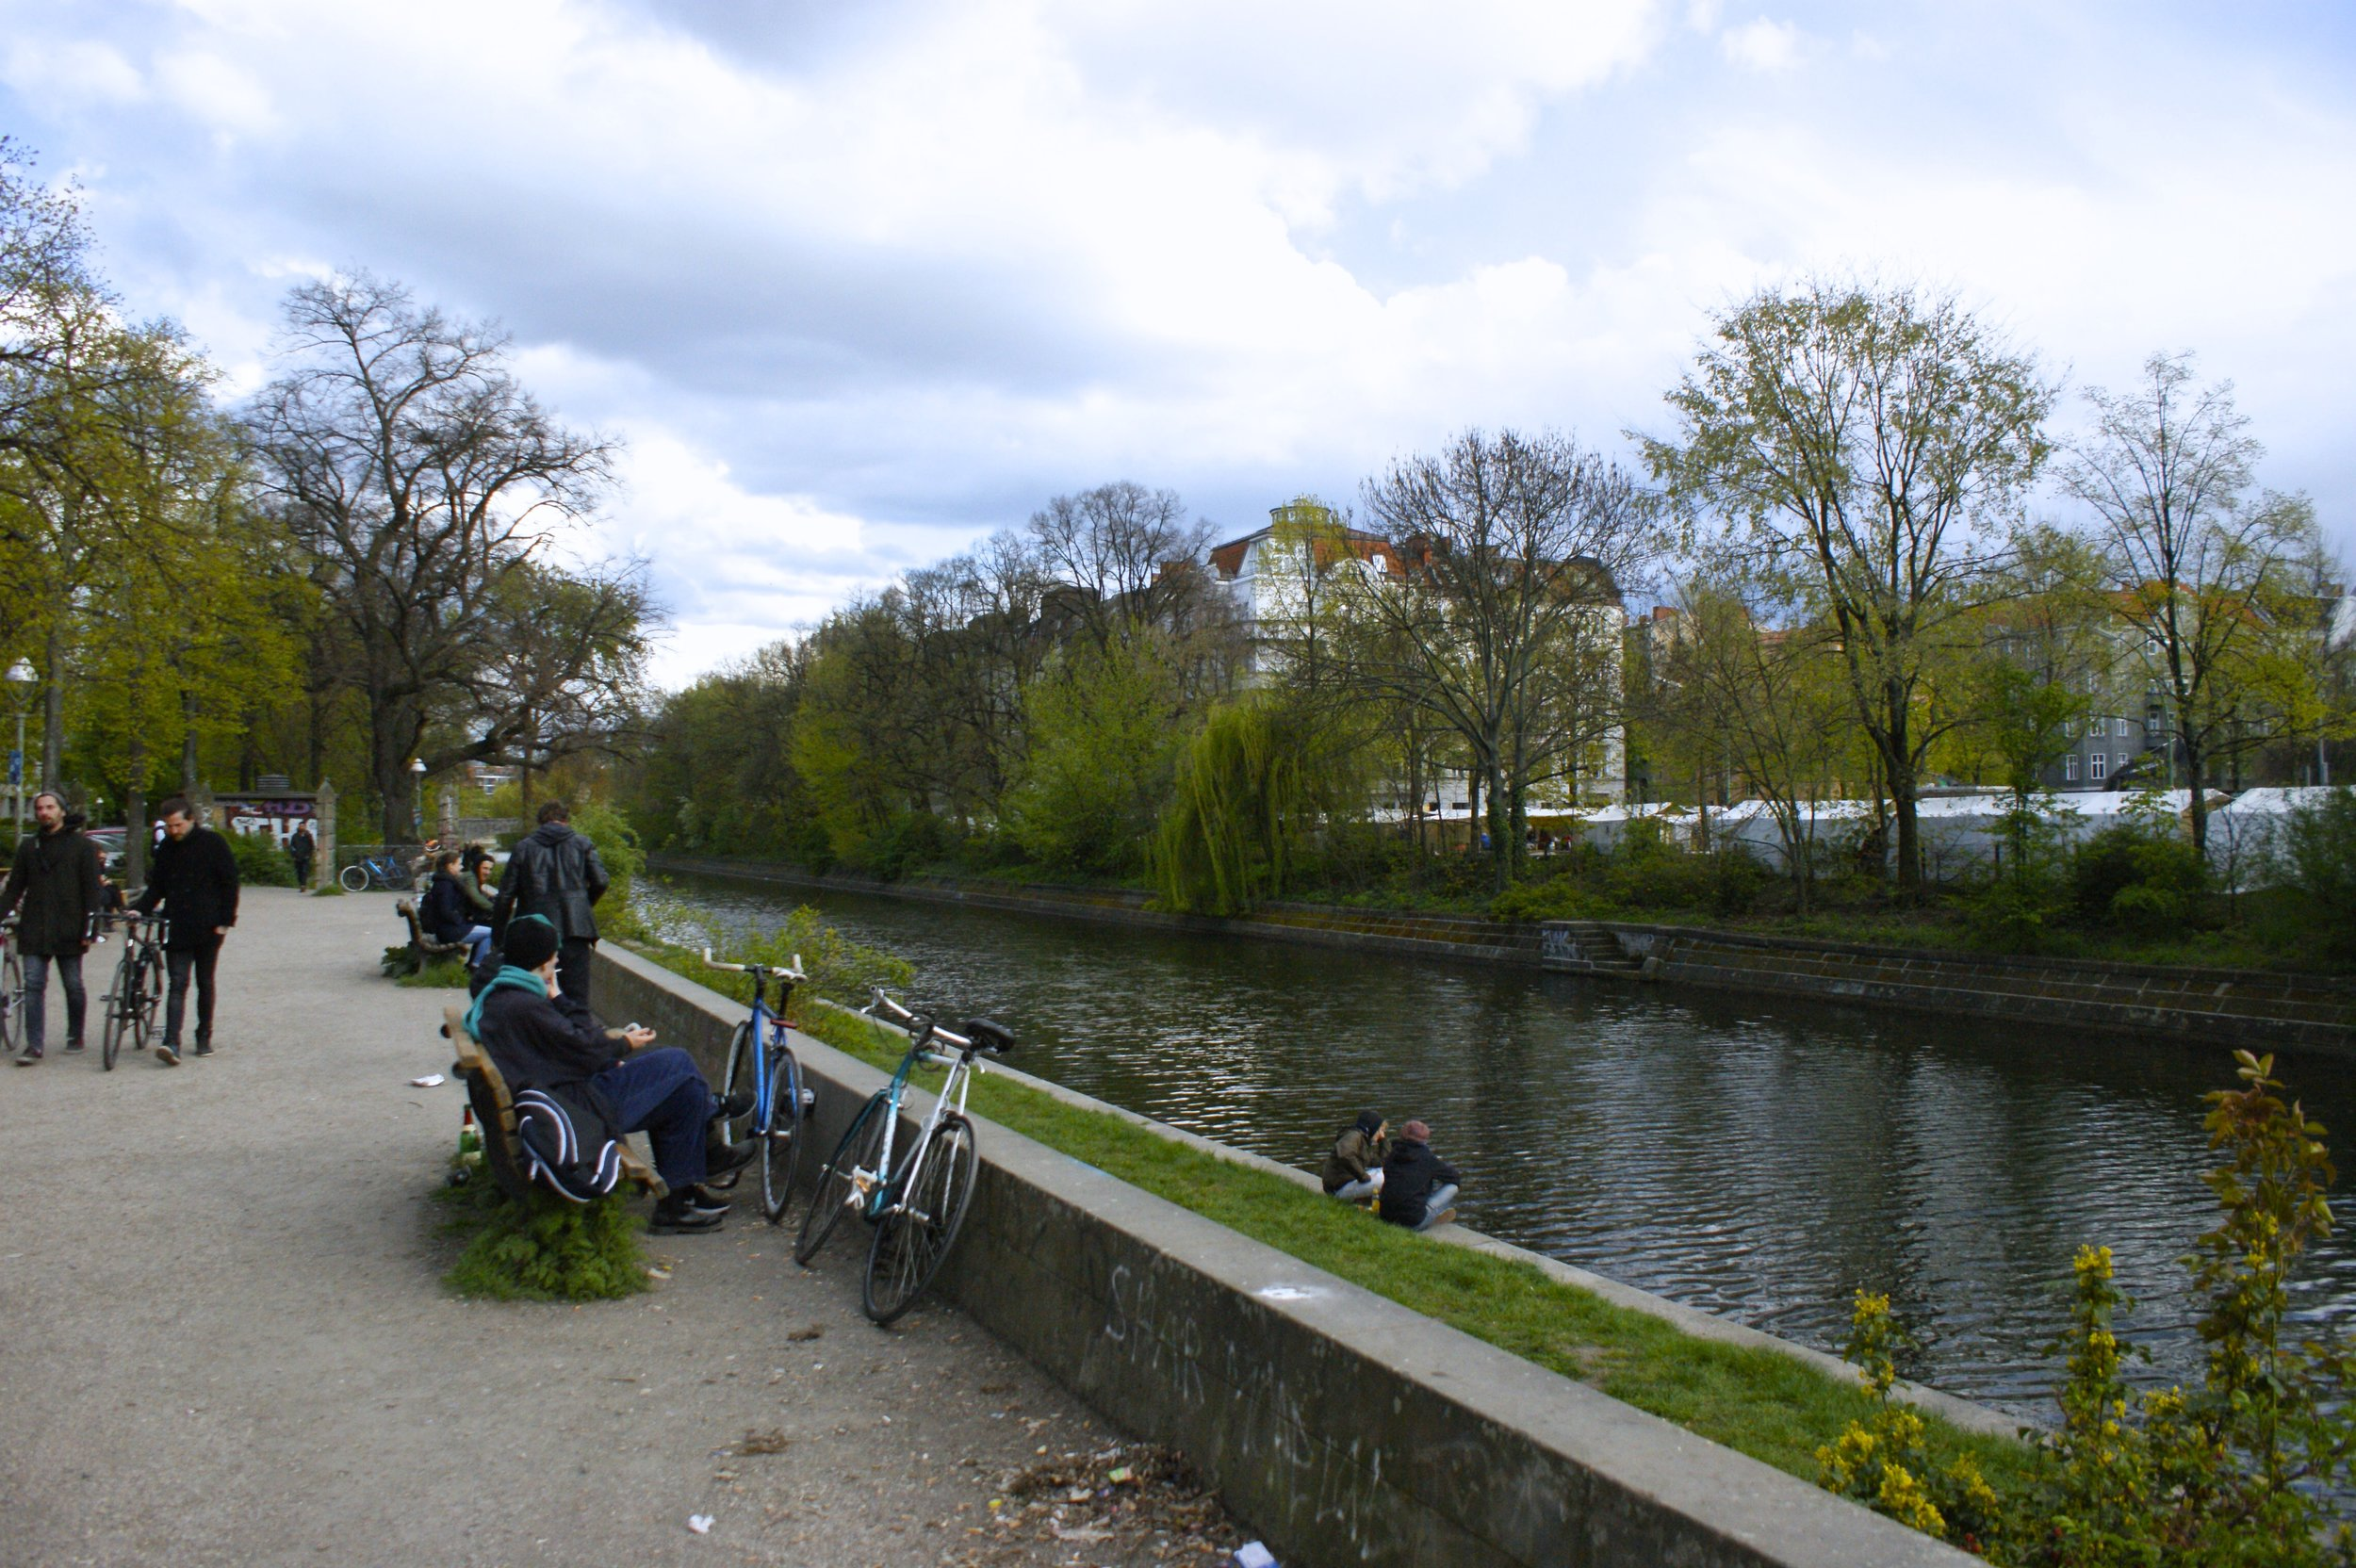 Kreuzberg, Berlin | Copyright Alexis Rockley, Local (Tourist)